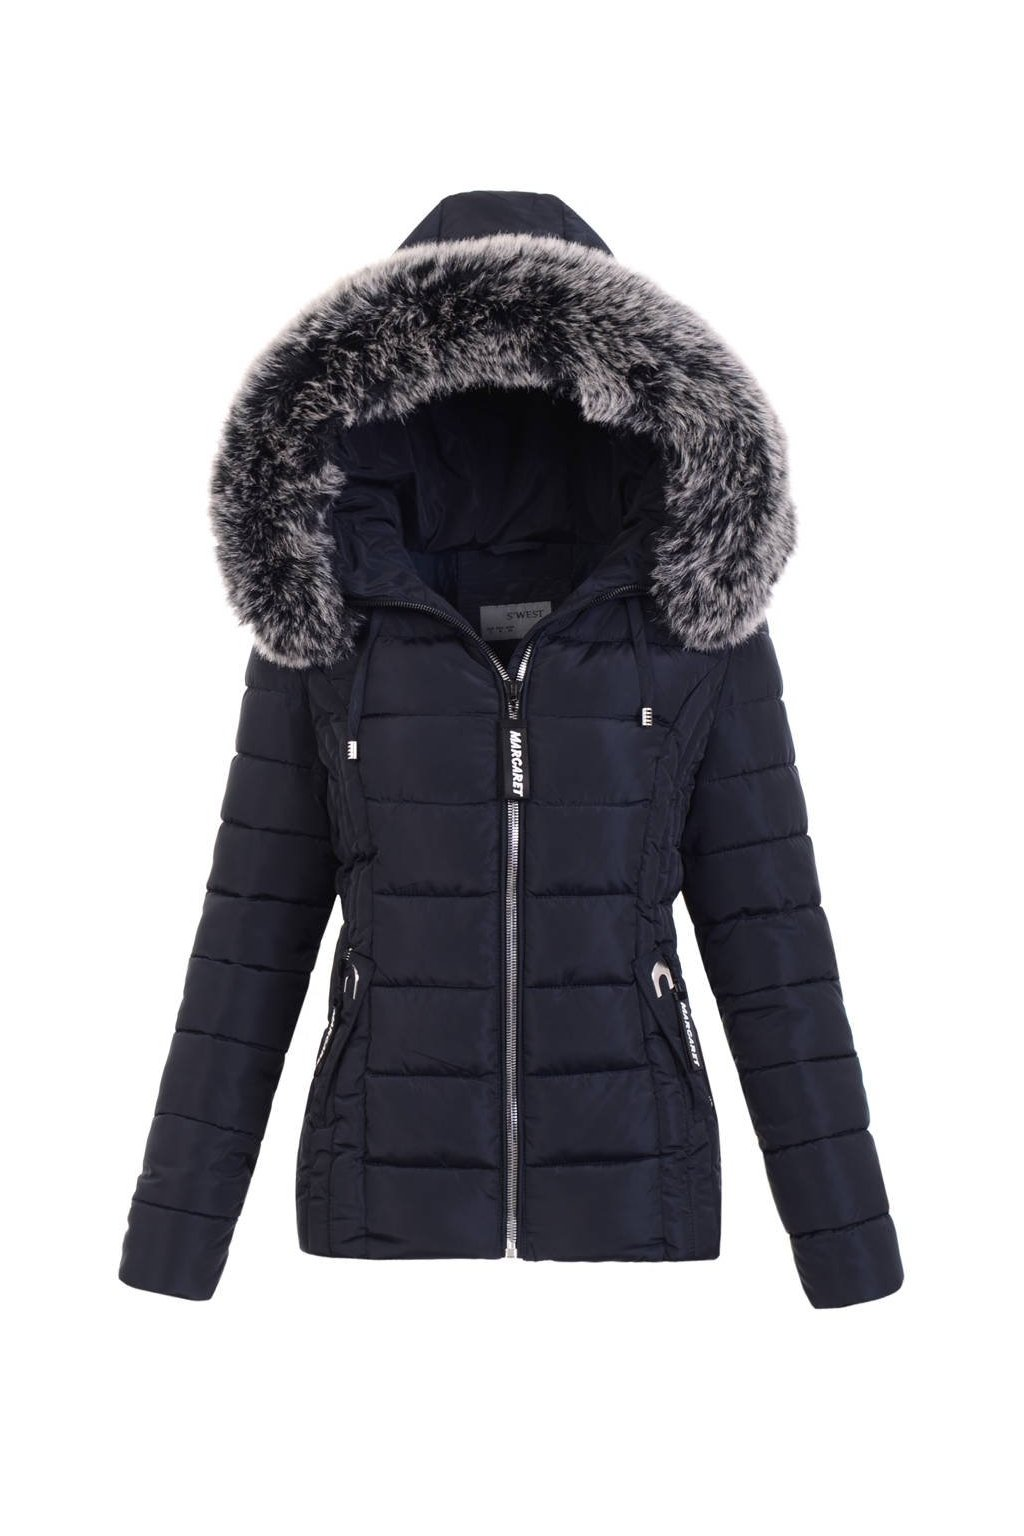 Dámska zimná bunda s kapucňou 5129 modrá